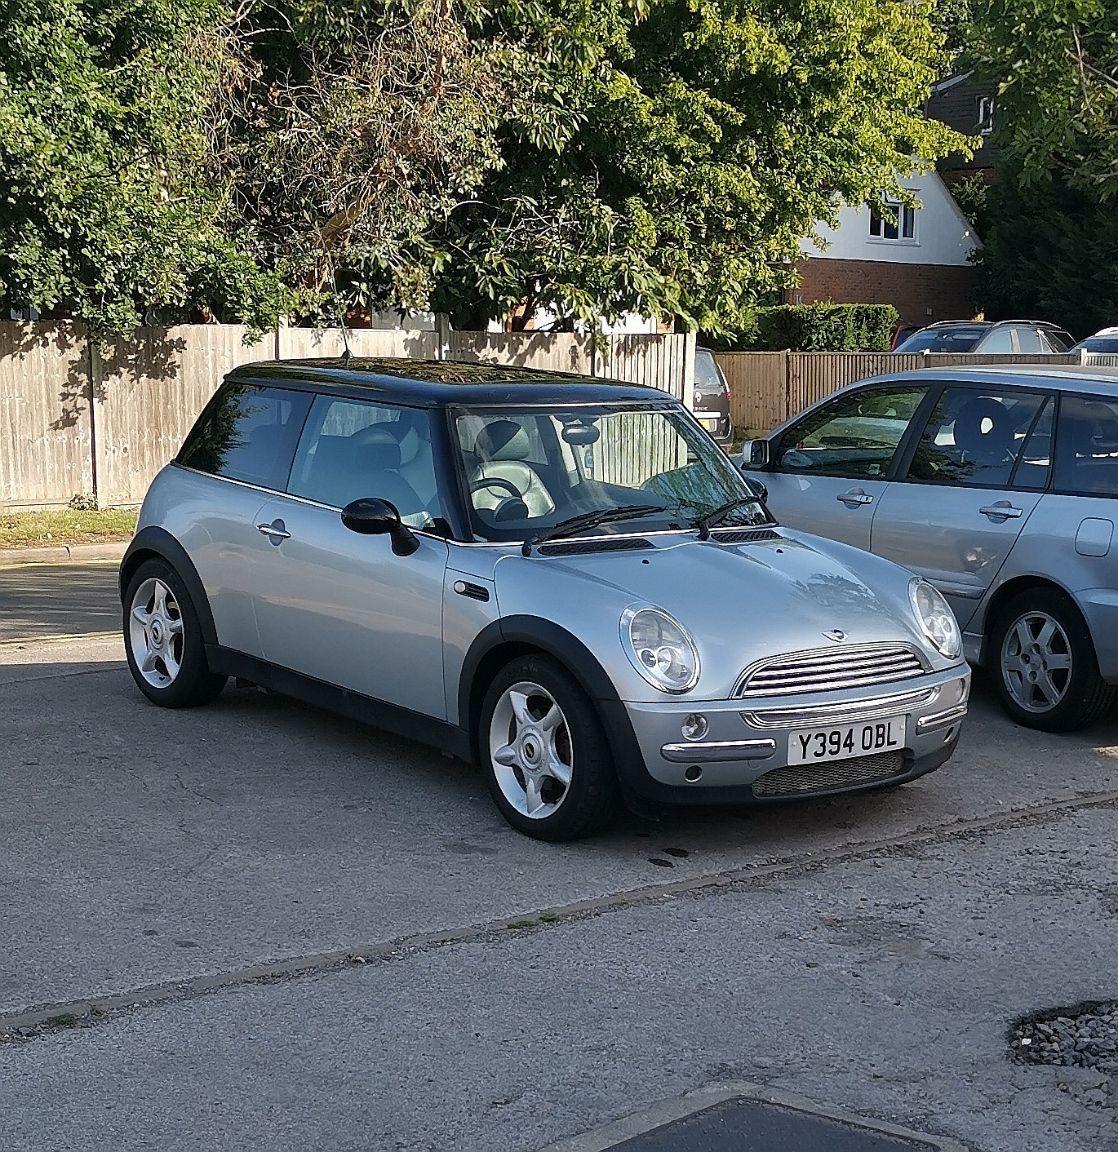 Photo of Silver Y Reg BMW MINI Cooper R50 Registration Number Y394OBL image 2